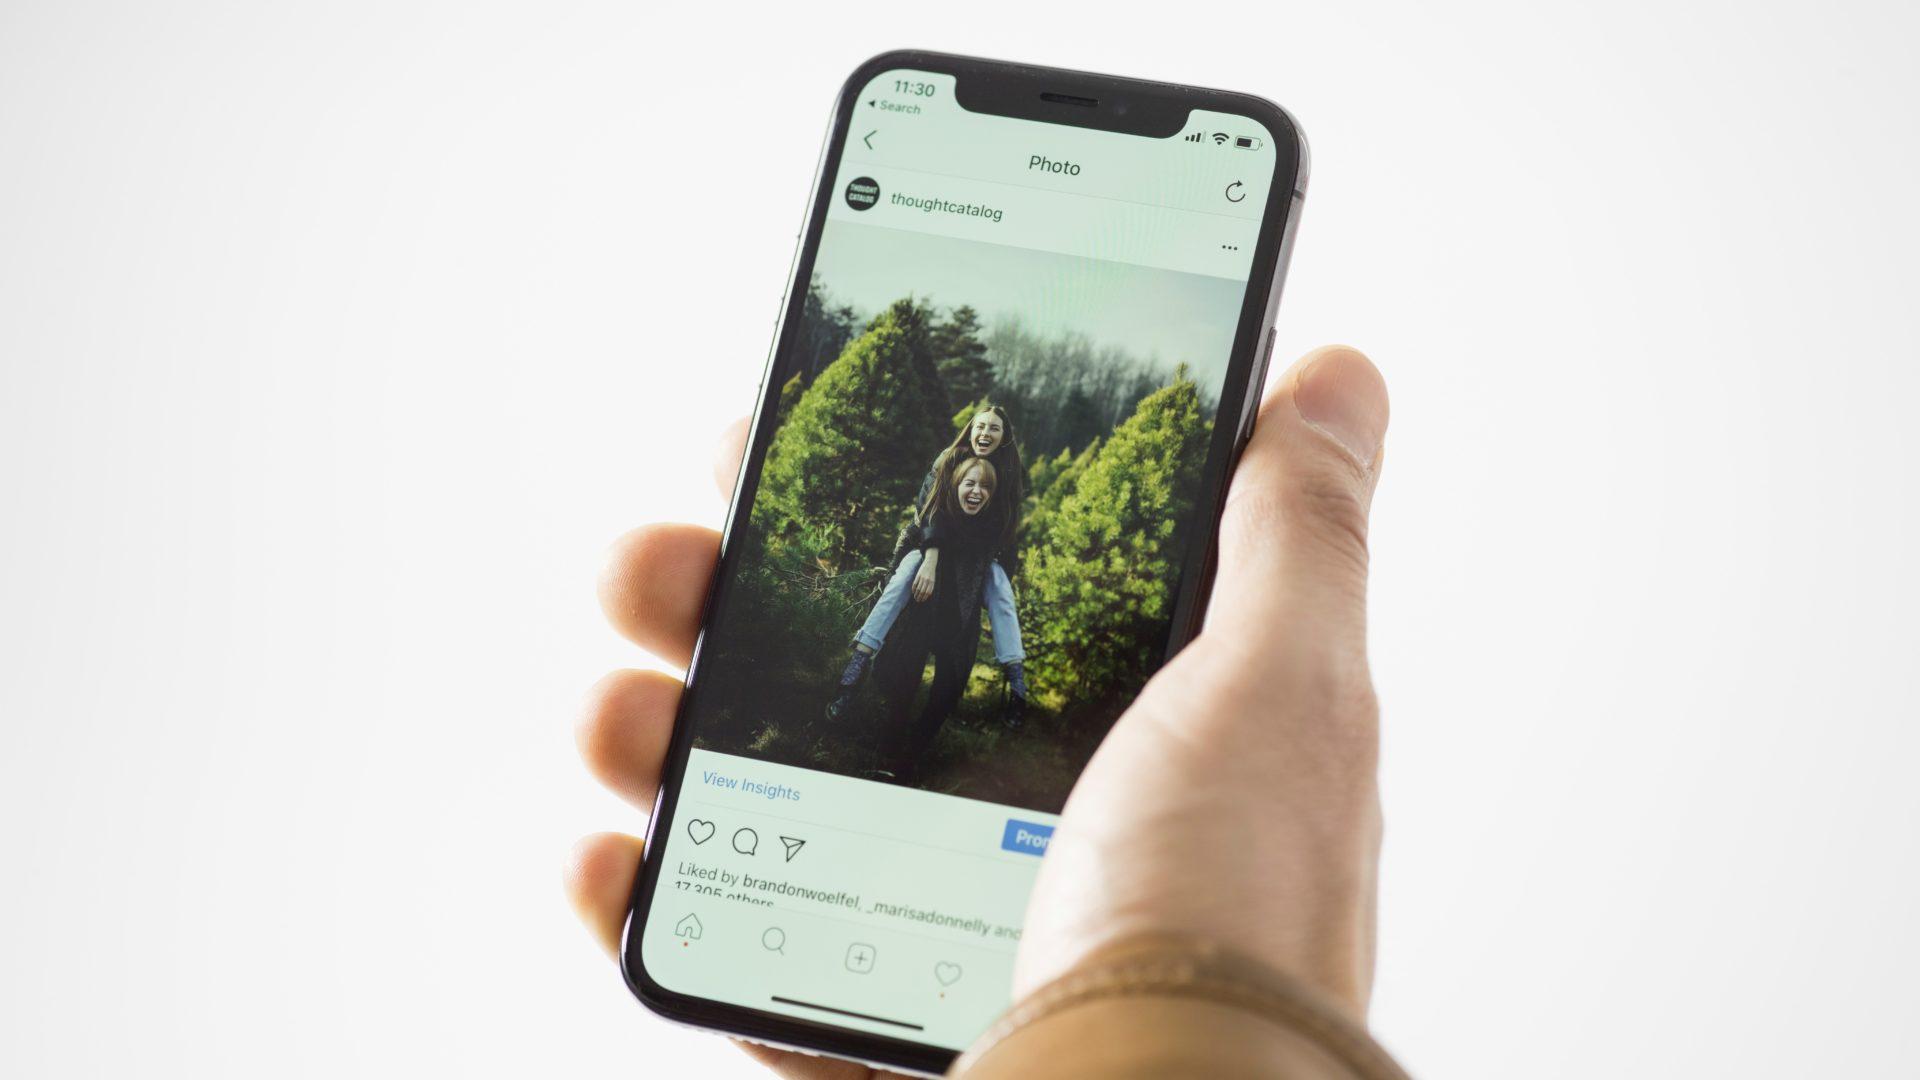 Instagramアプリで興味のないユーザーをミュートする機能が実装される!+Instagramでミュートする方法